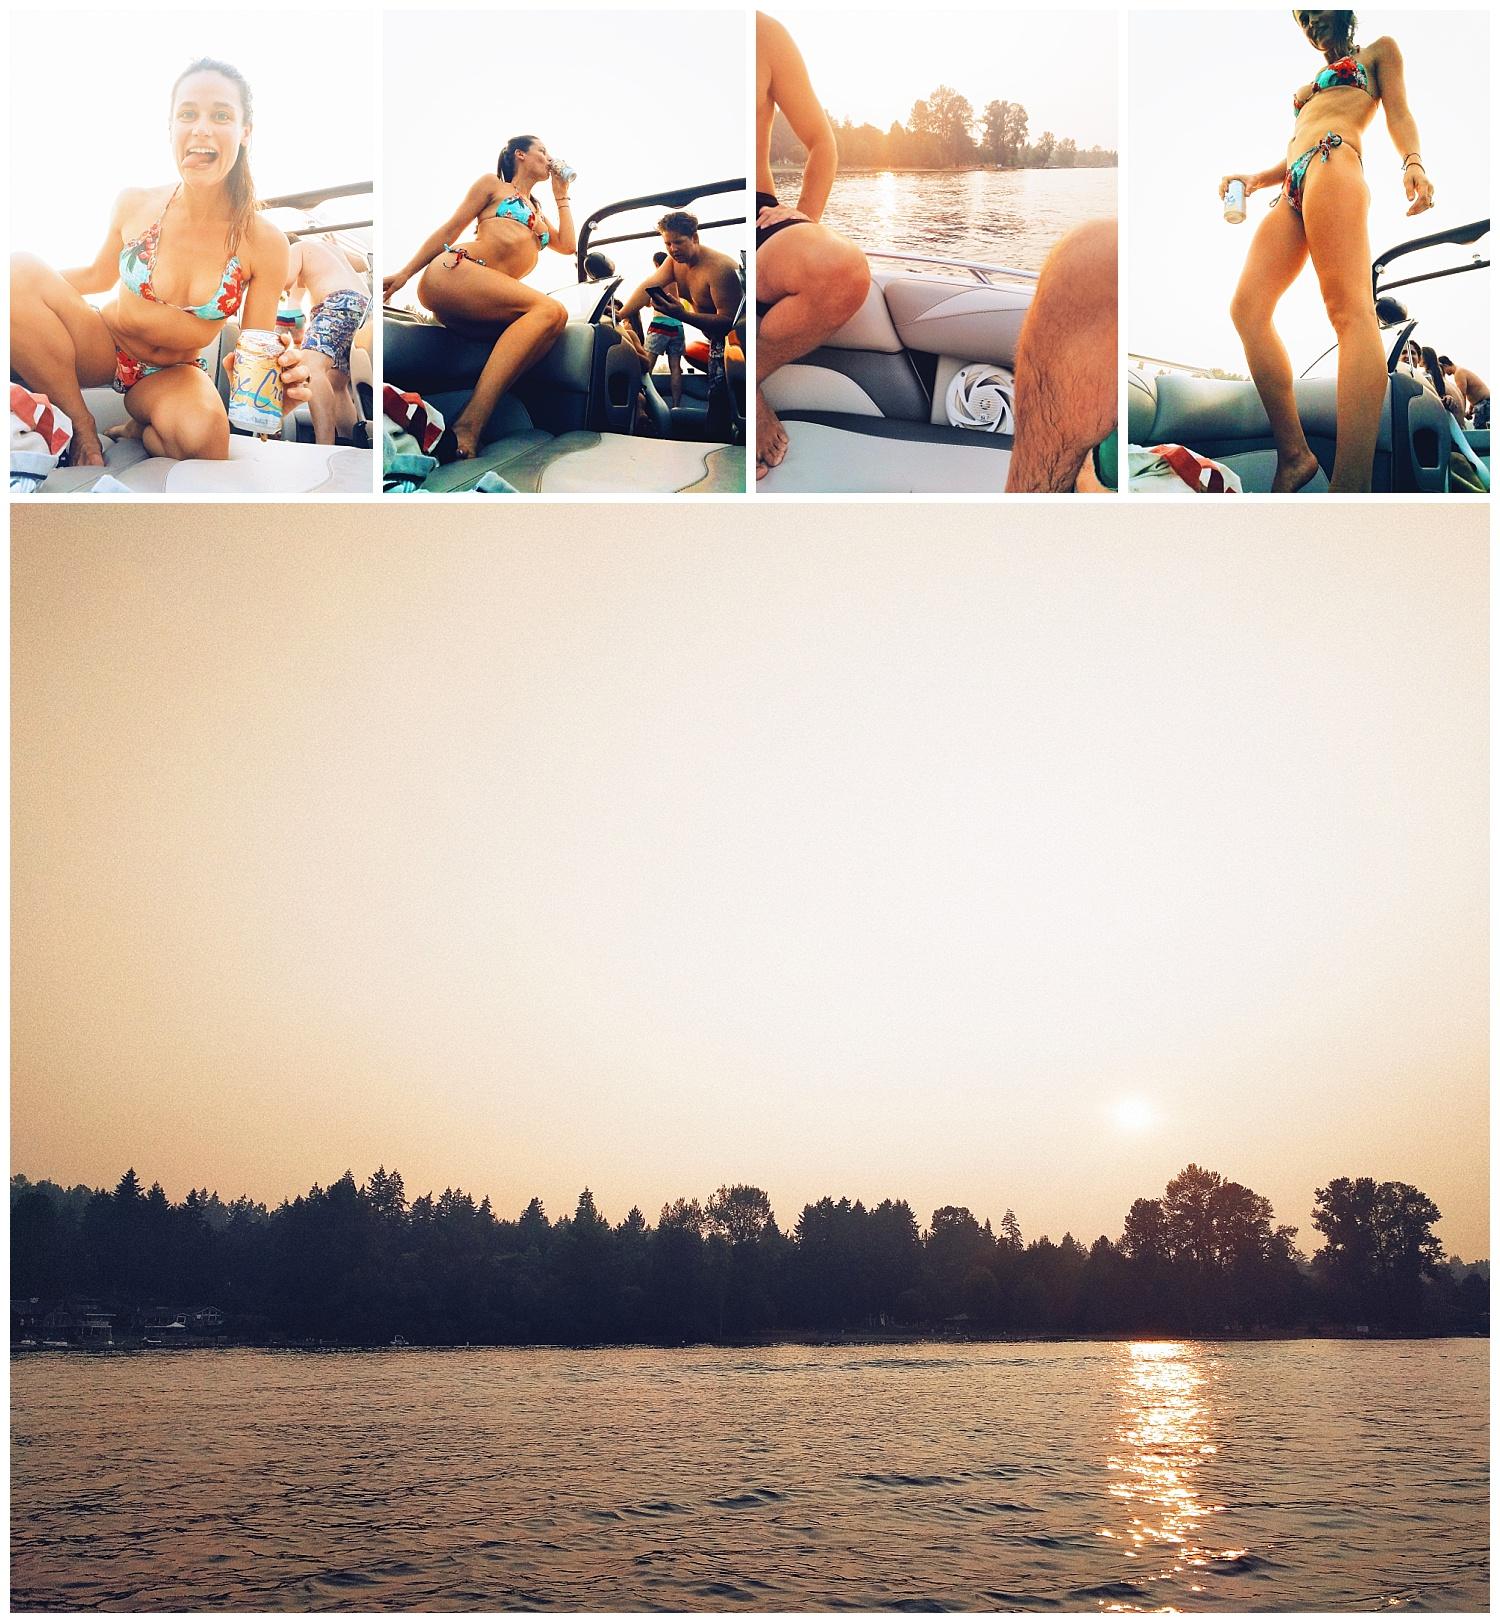 cha+wilde+on+a+boat+-+lake+sammamish.jpg